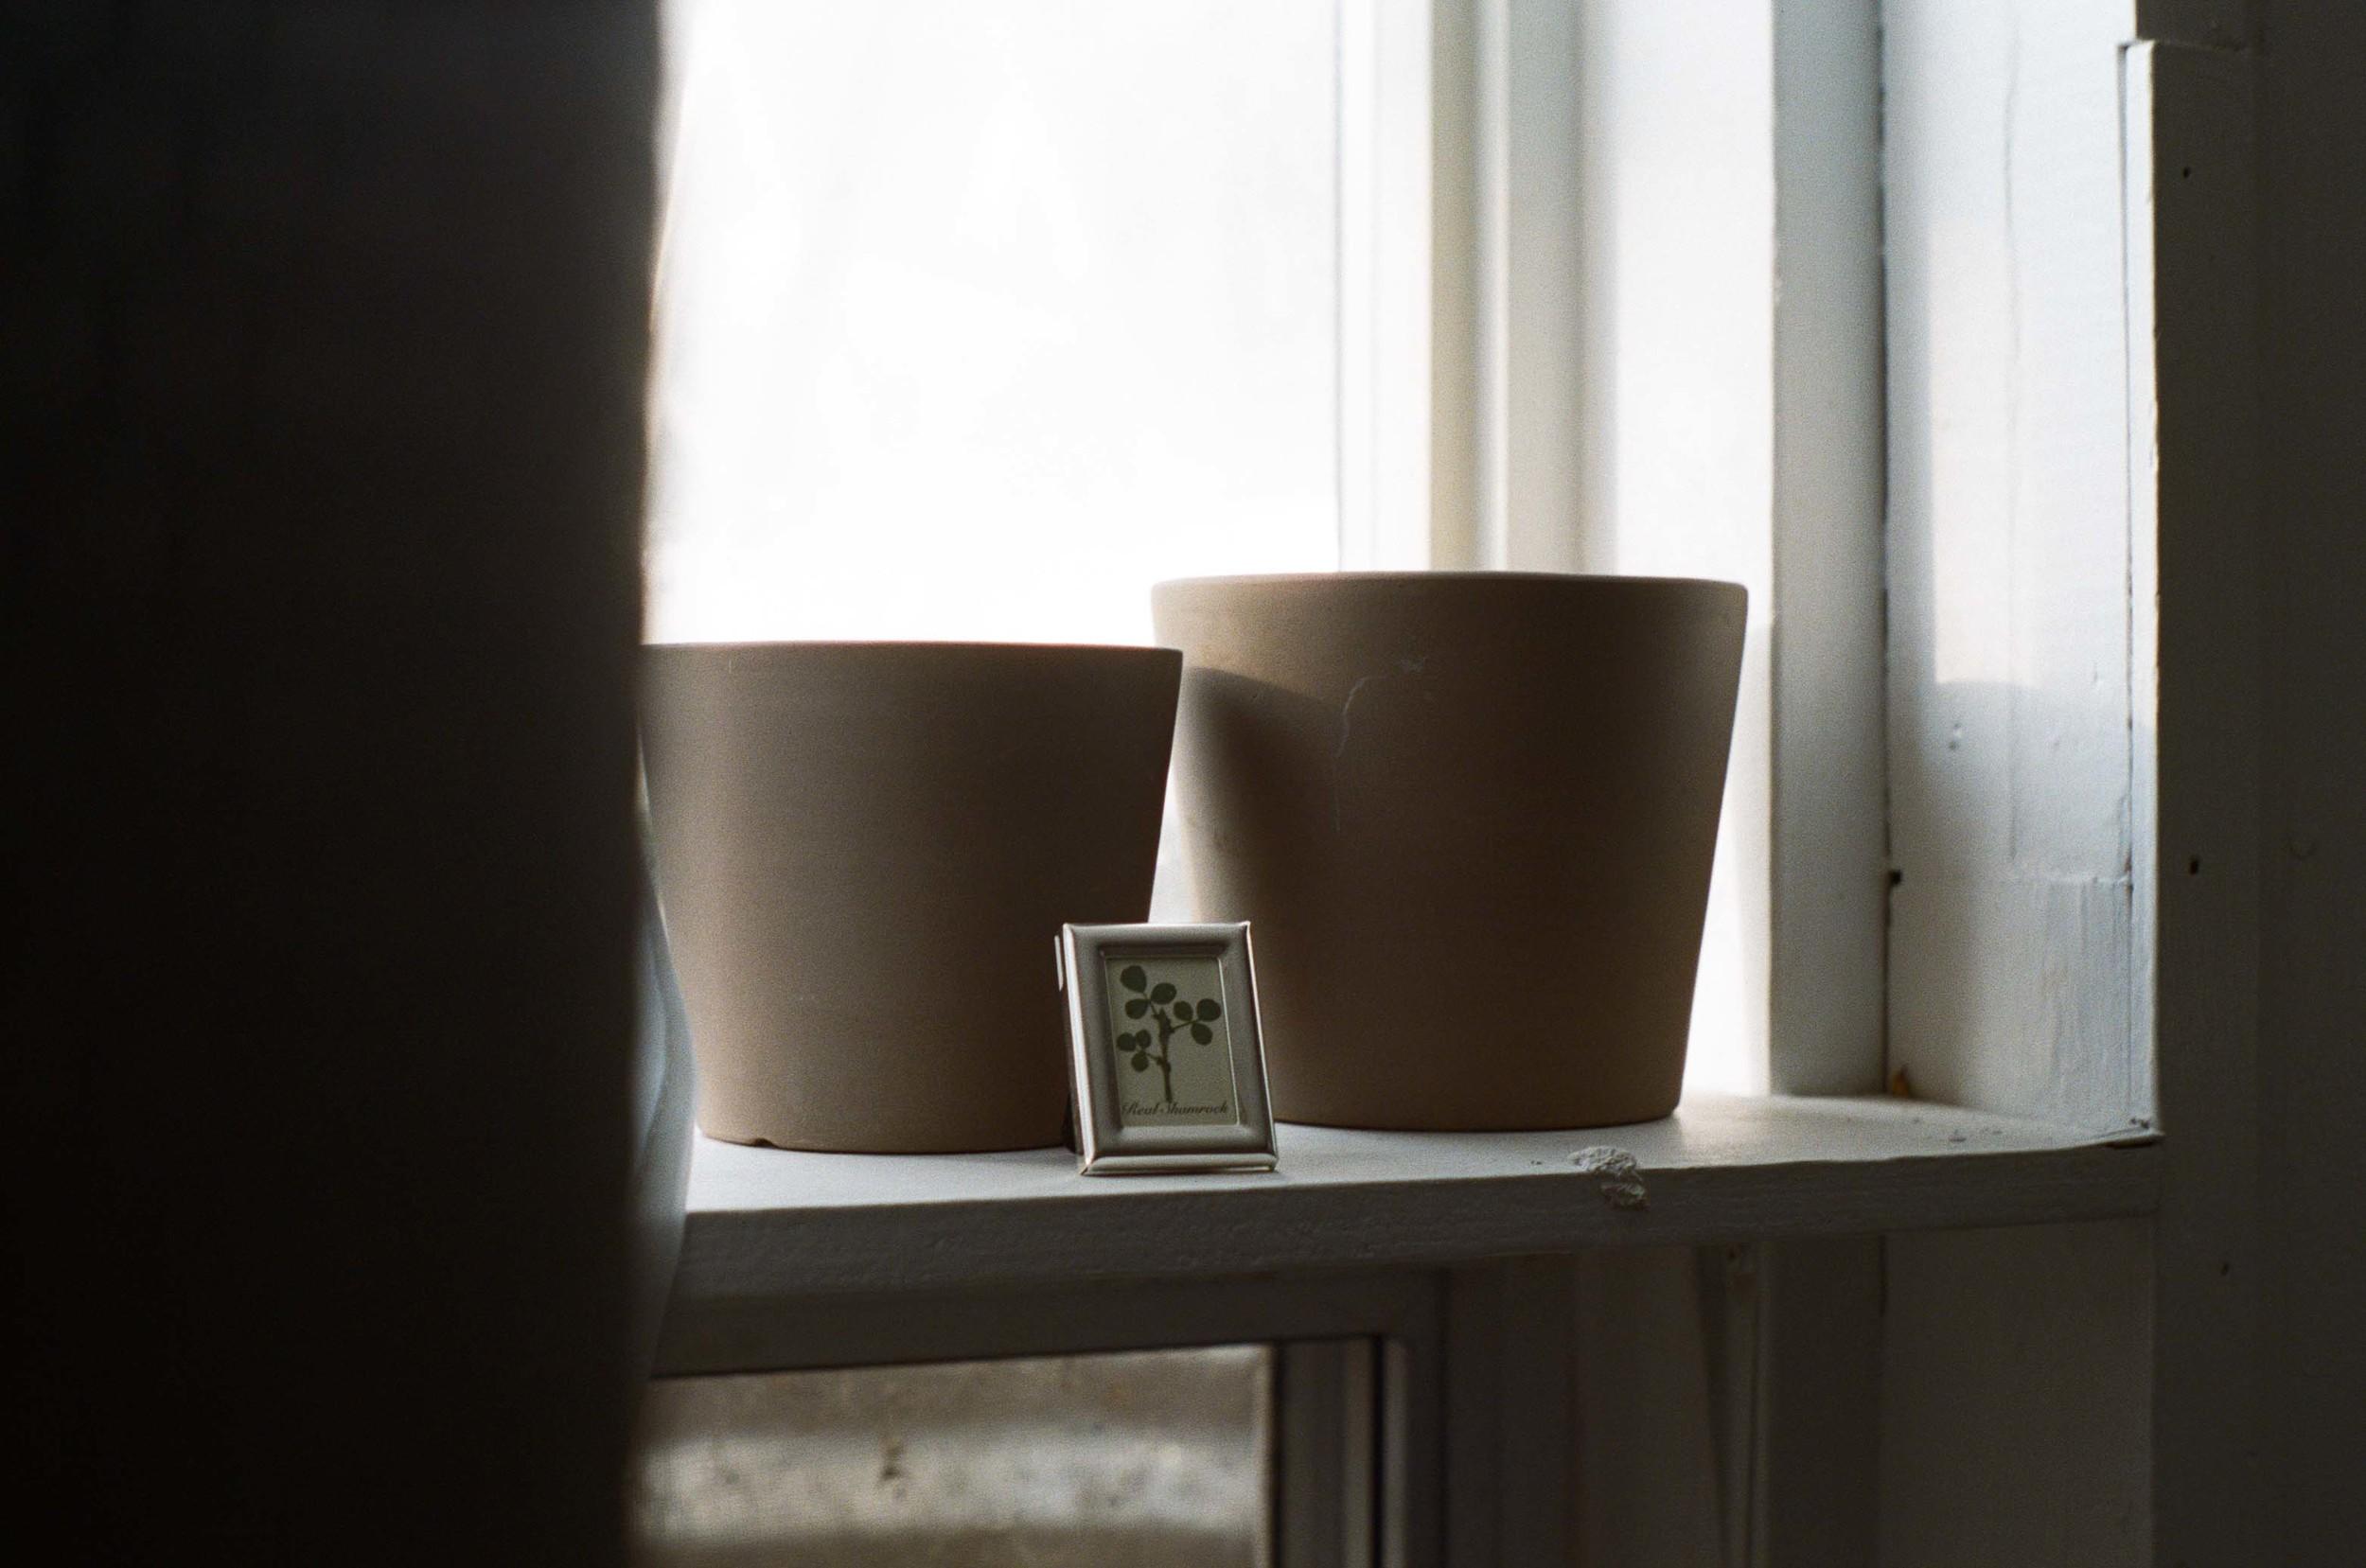 shelf_shamrock_natural_light_35mm_film_window_lauren_ashmore